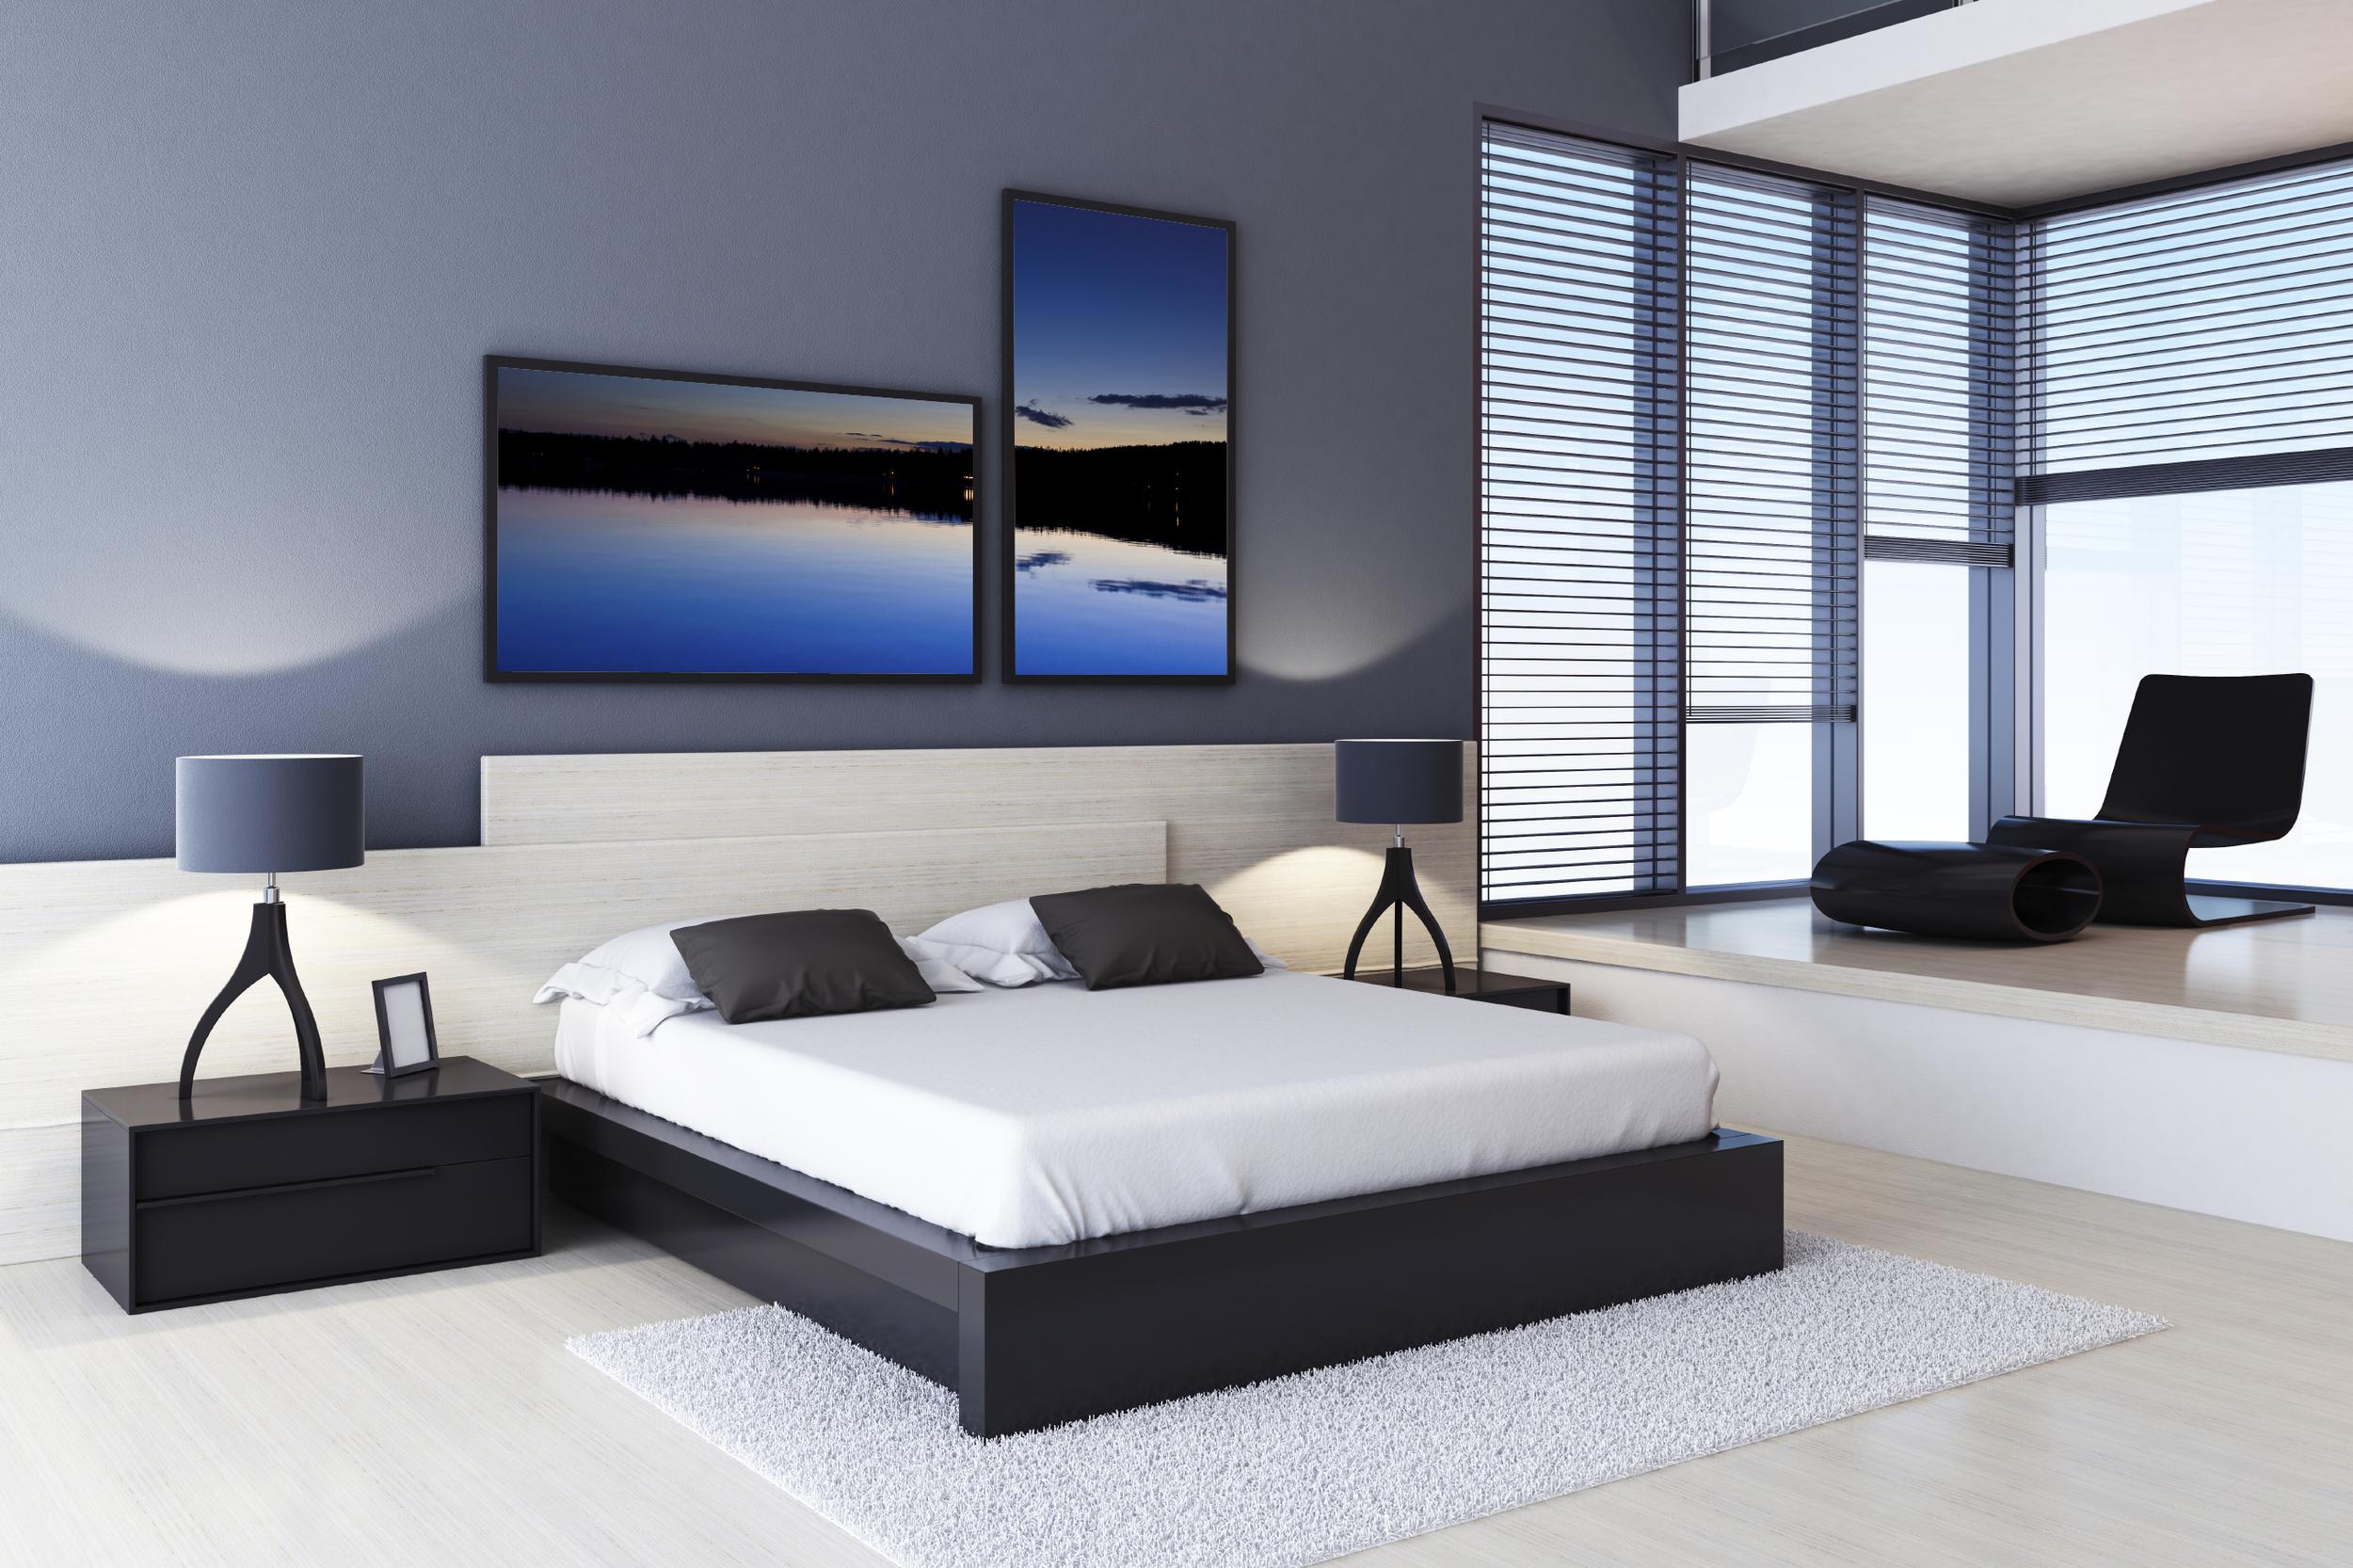 Room 5 - Nature 3.jpg